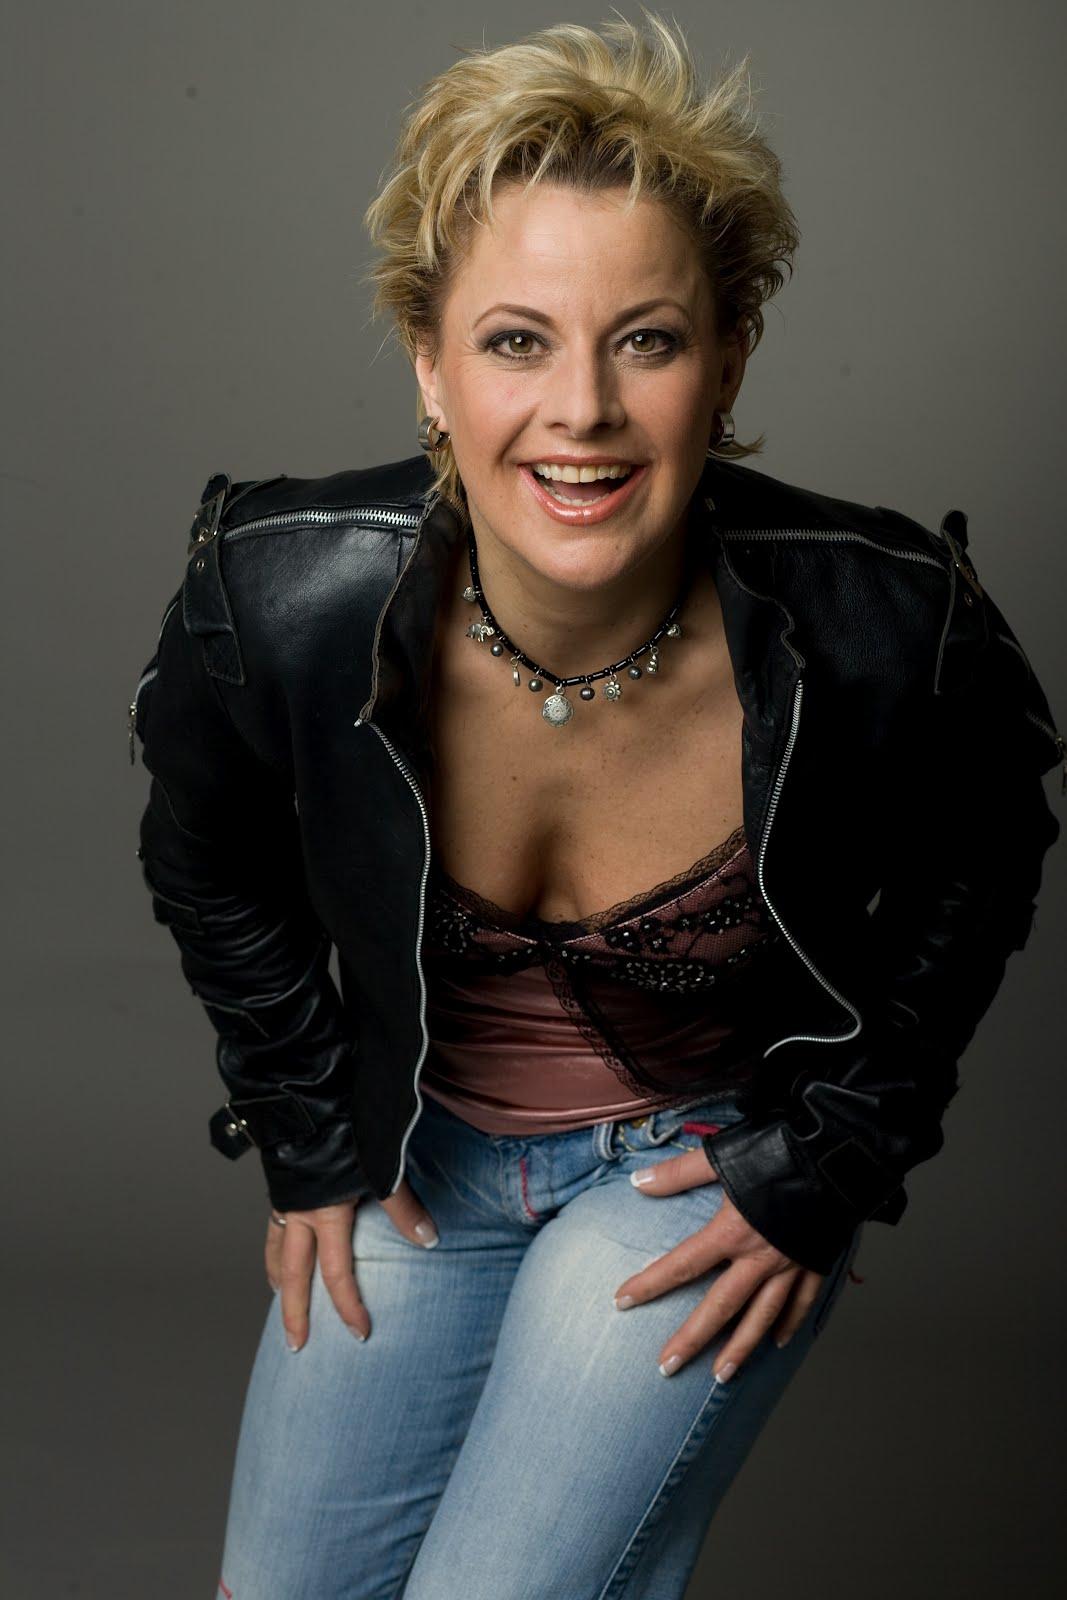 Tanja Schumann